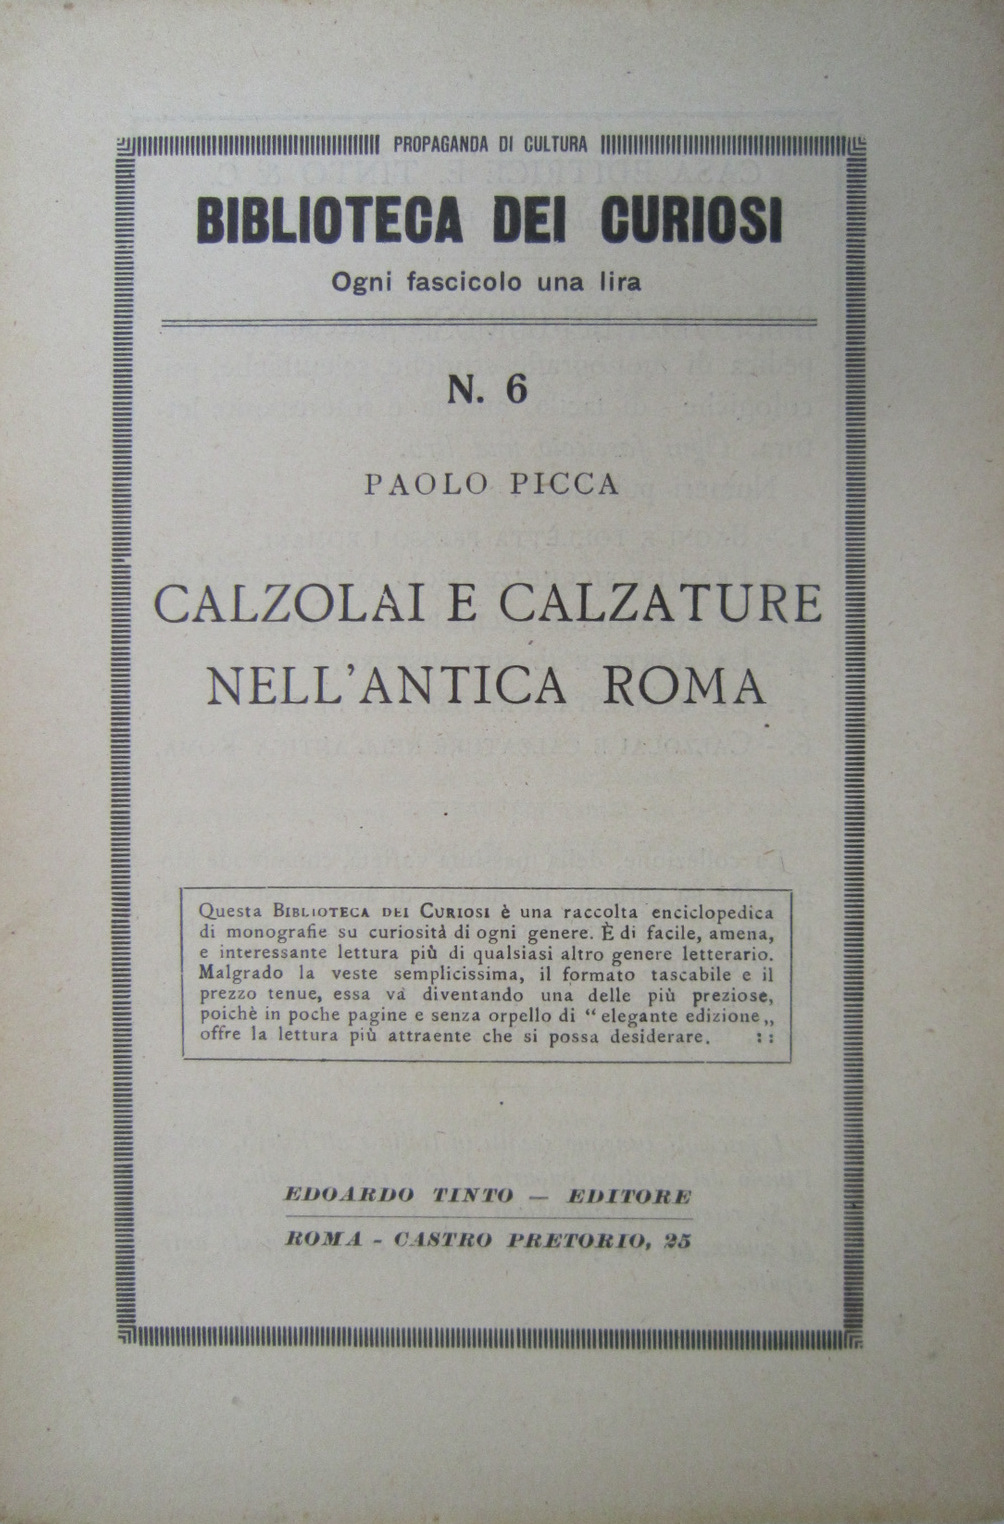 Calzolai e calzature nell'antica Roma